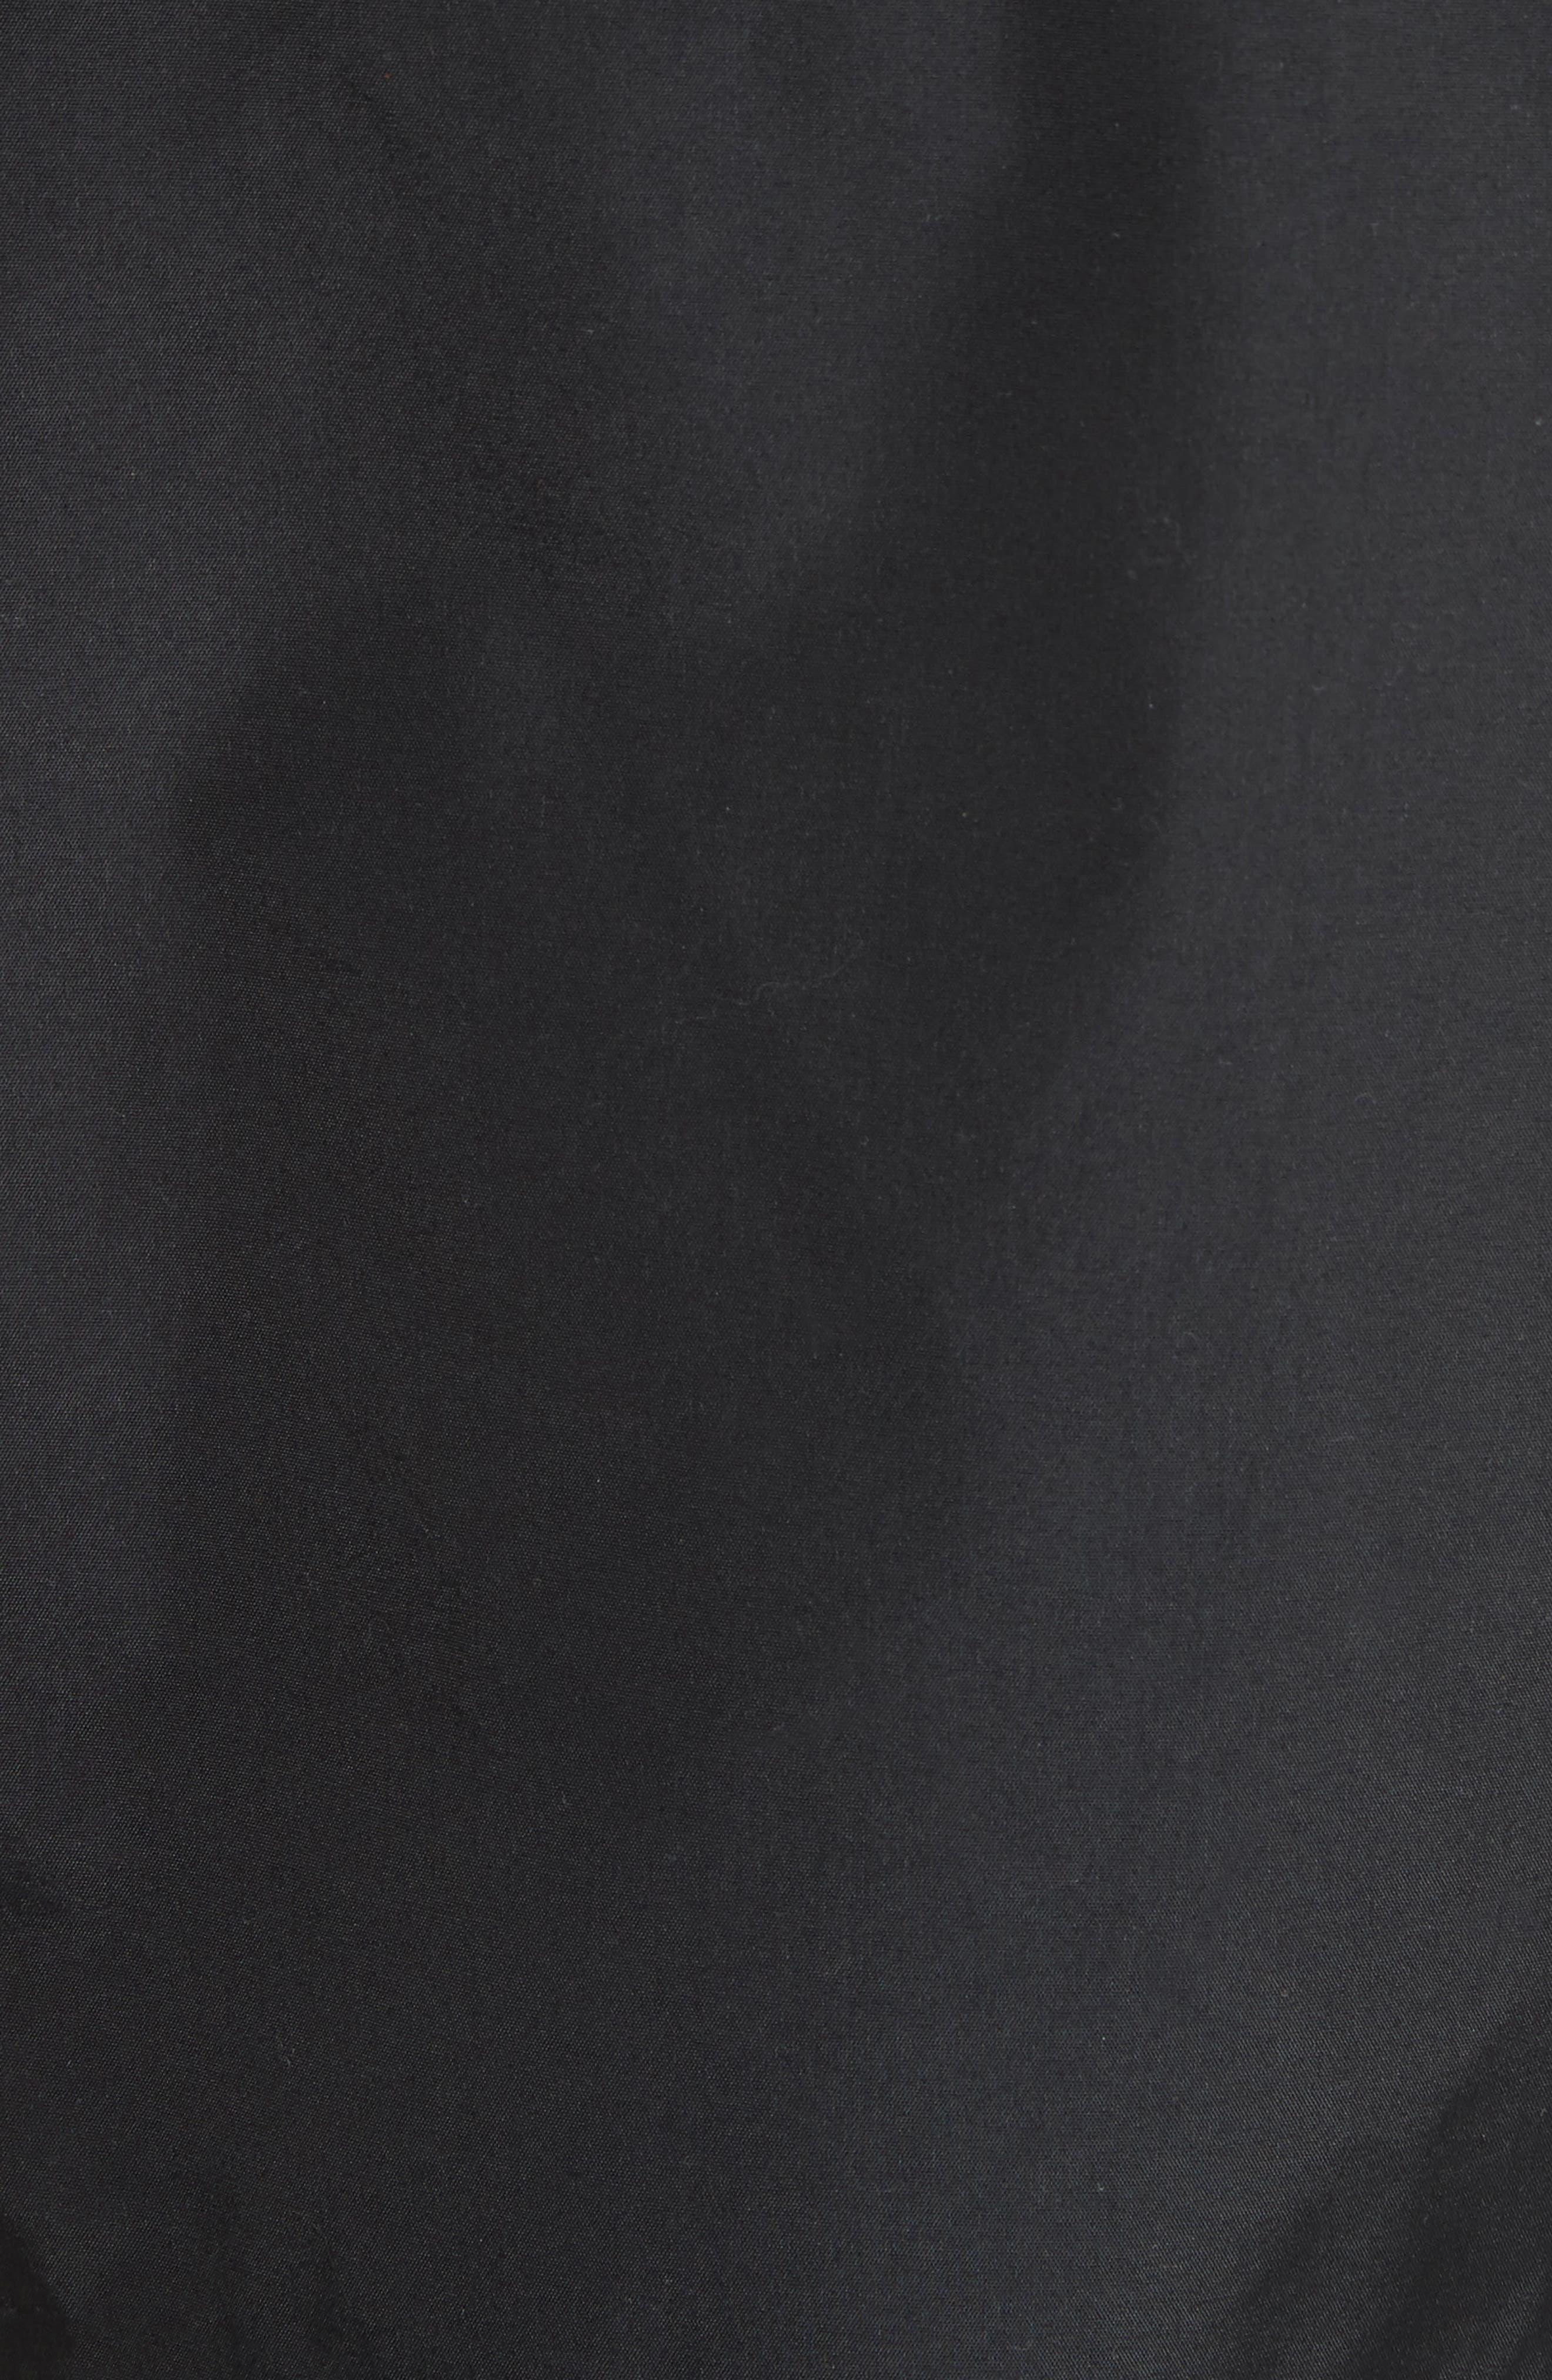 Kersbrook BXS Nylon Jacket,                             Alternate thumbnail 5, color,                             Black